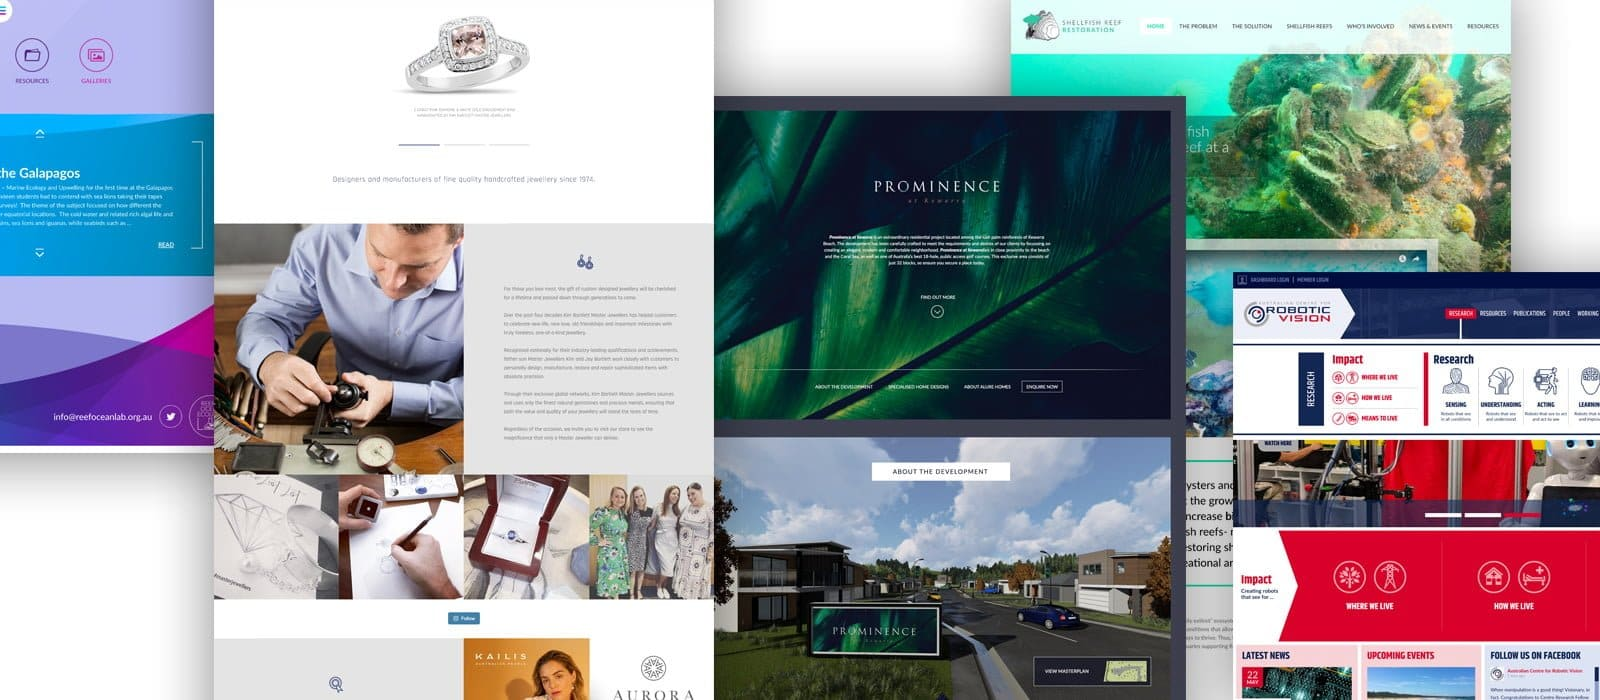 Websites by Zephyrmedia